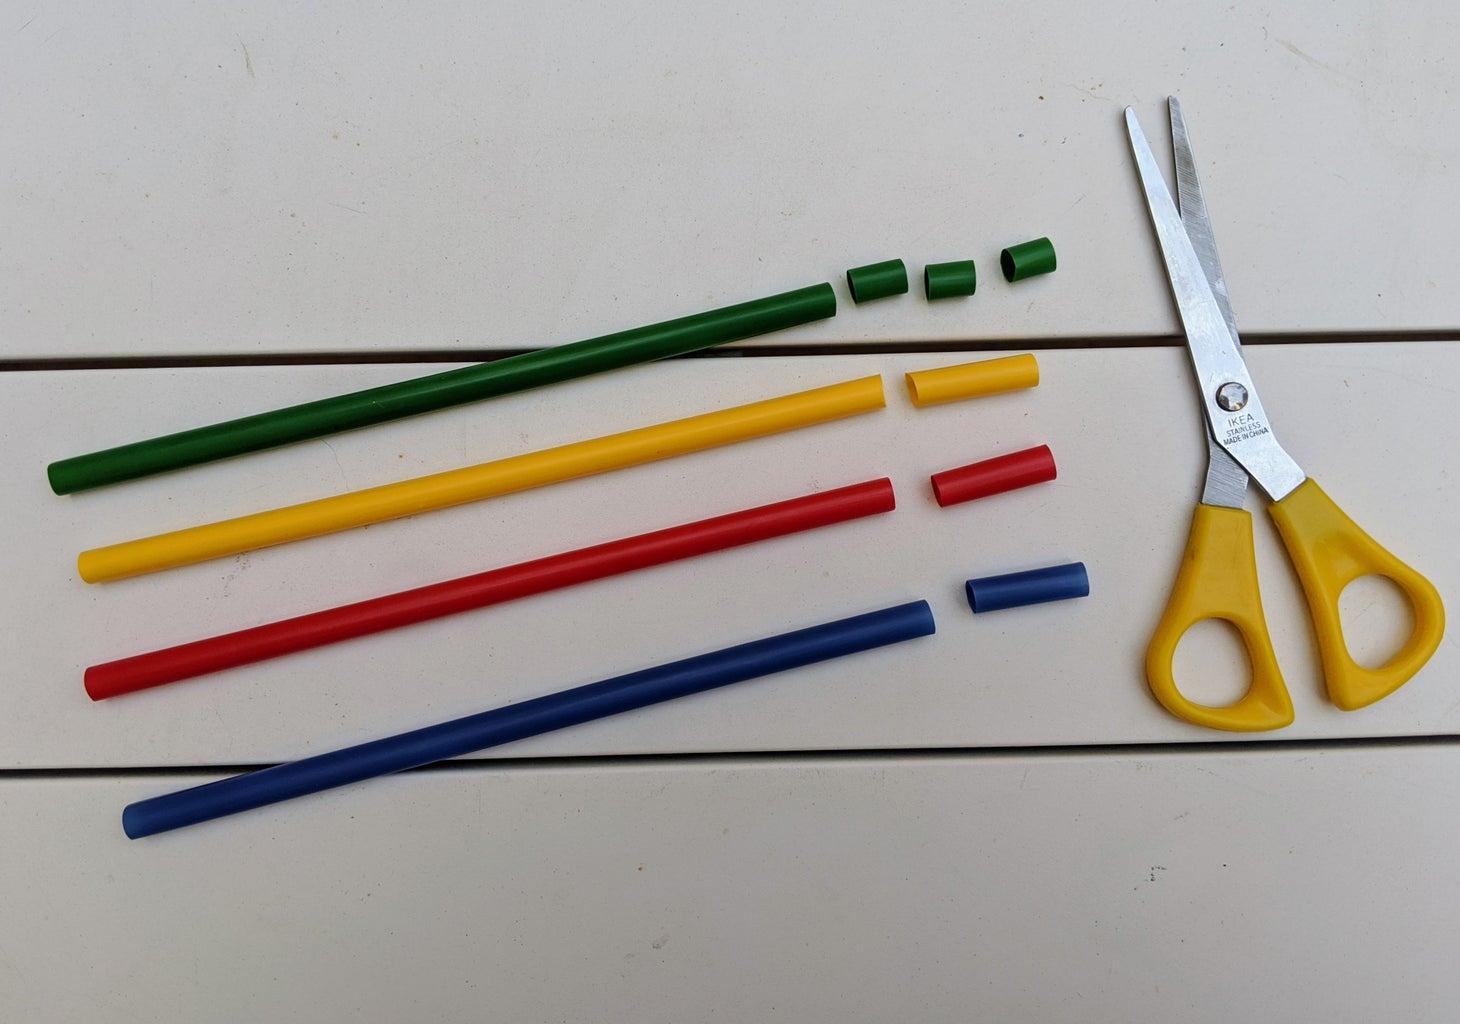 Cut the Plastic Straws